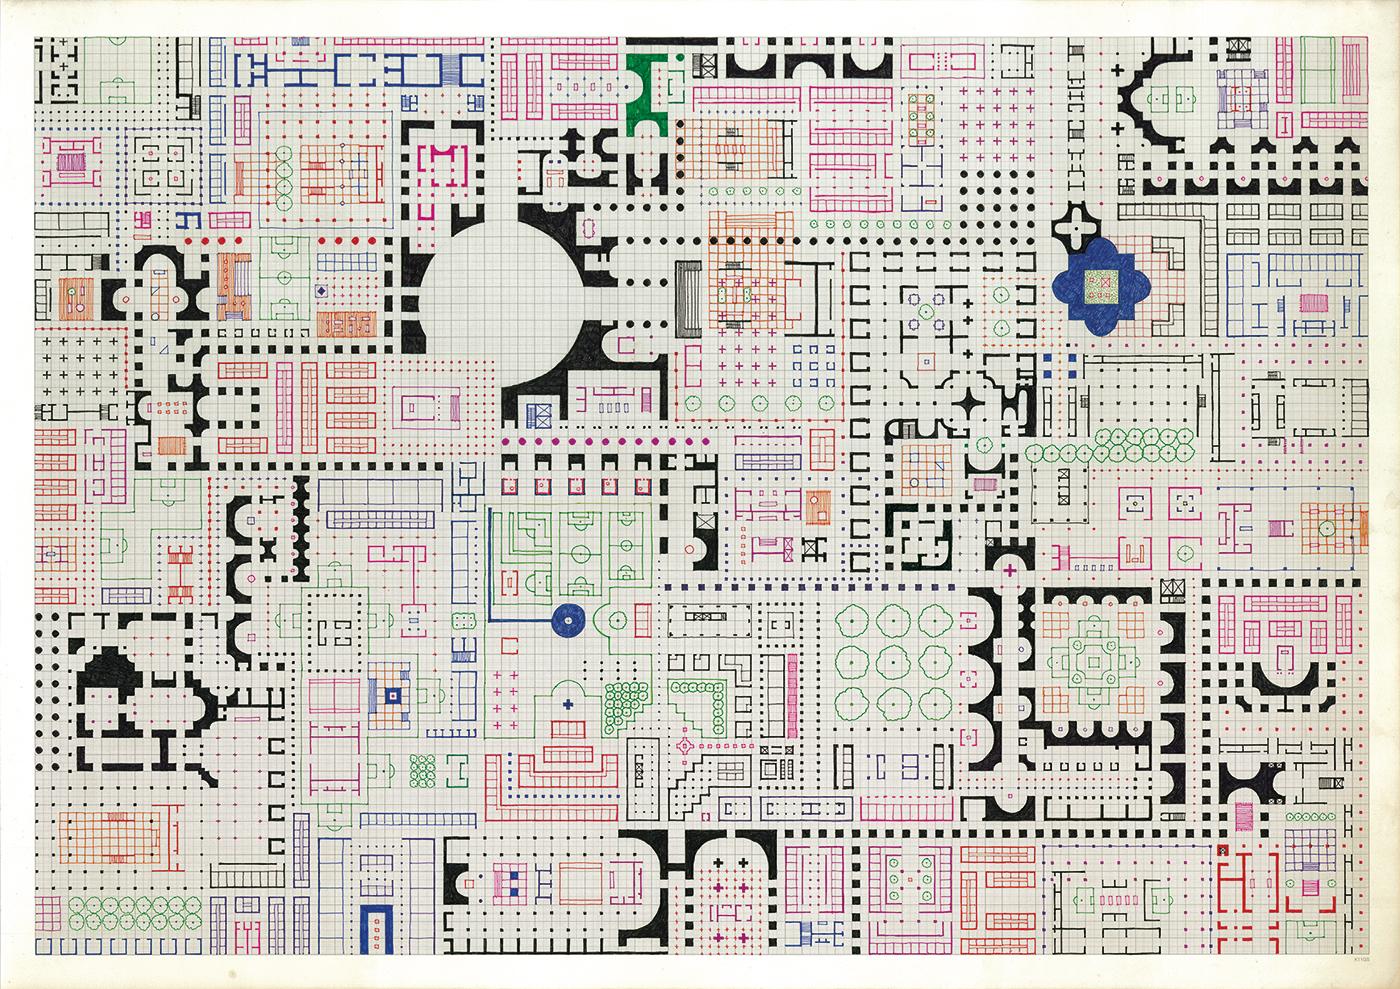 Empire of Ice Cream No.11 , 2011-2018 ink on graph paper 59.4 x 84.1 cm